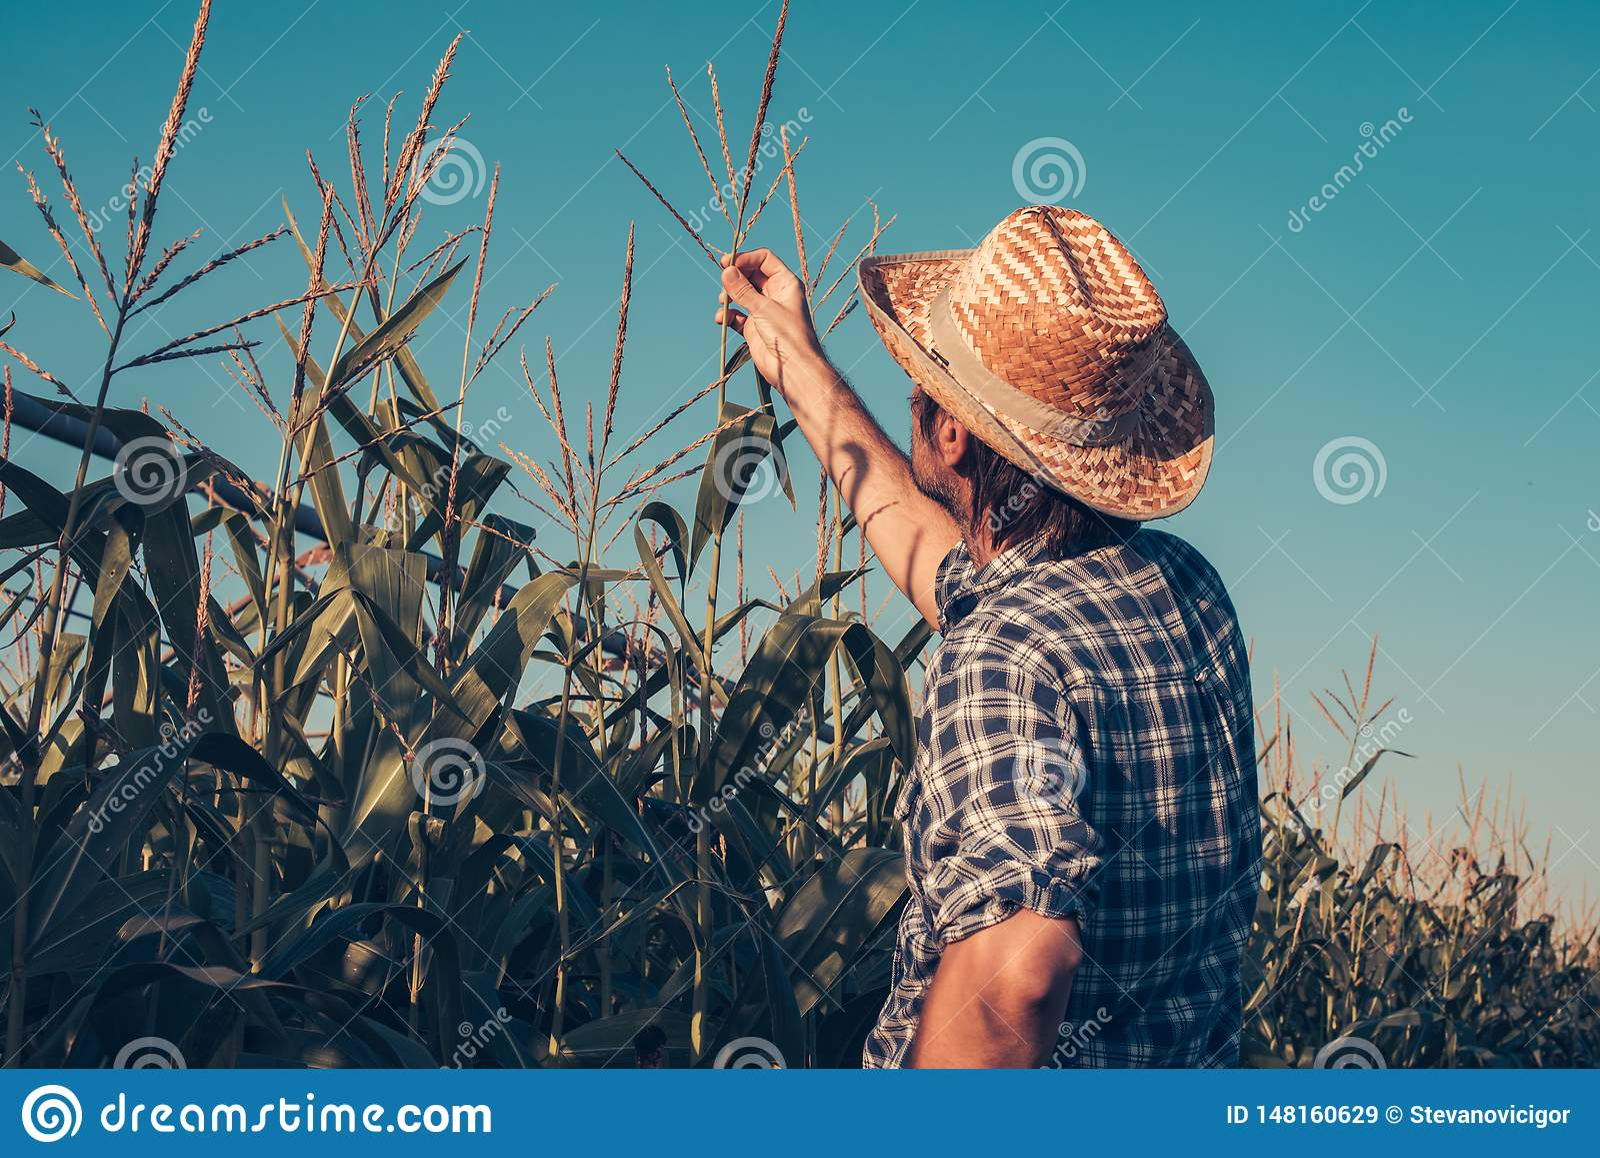 Granjero que examina la borla del maíz